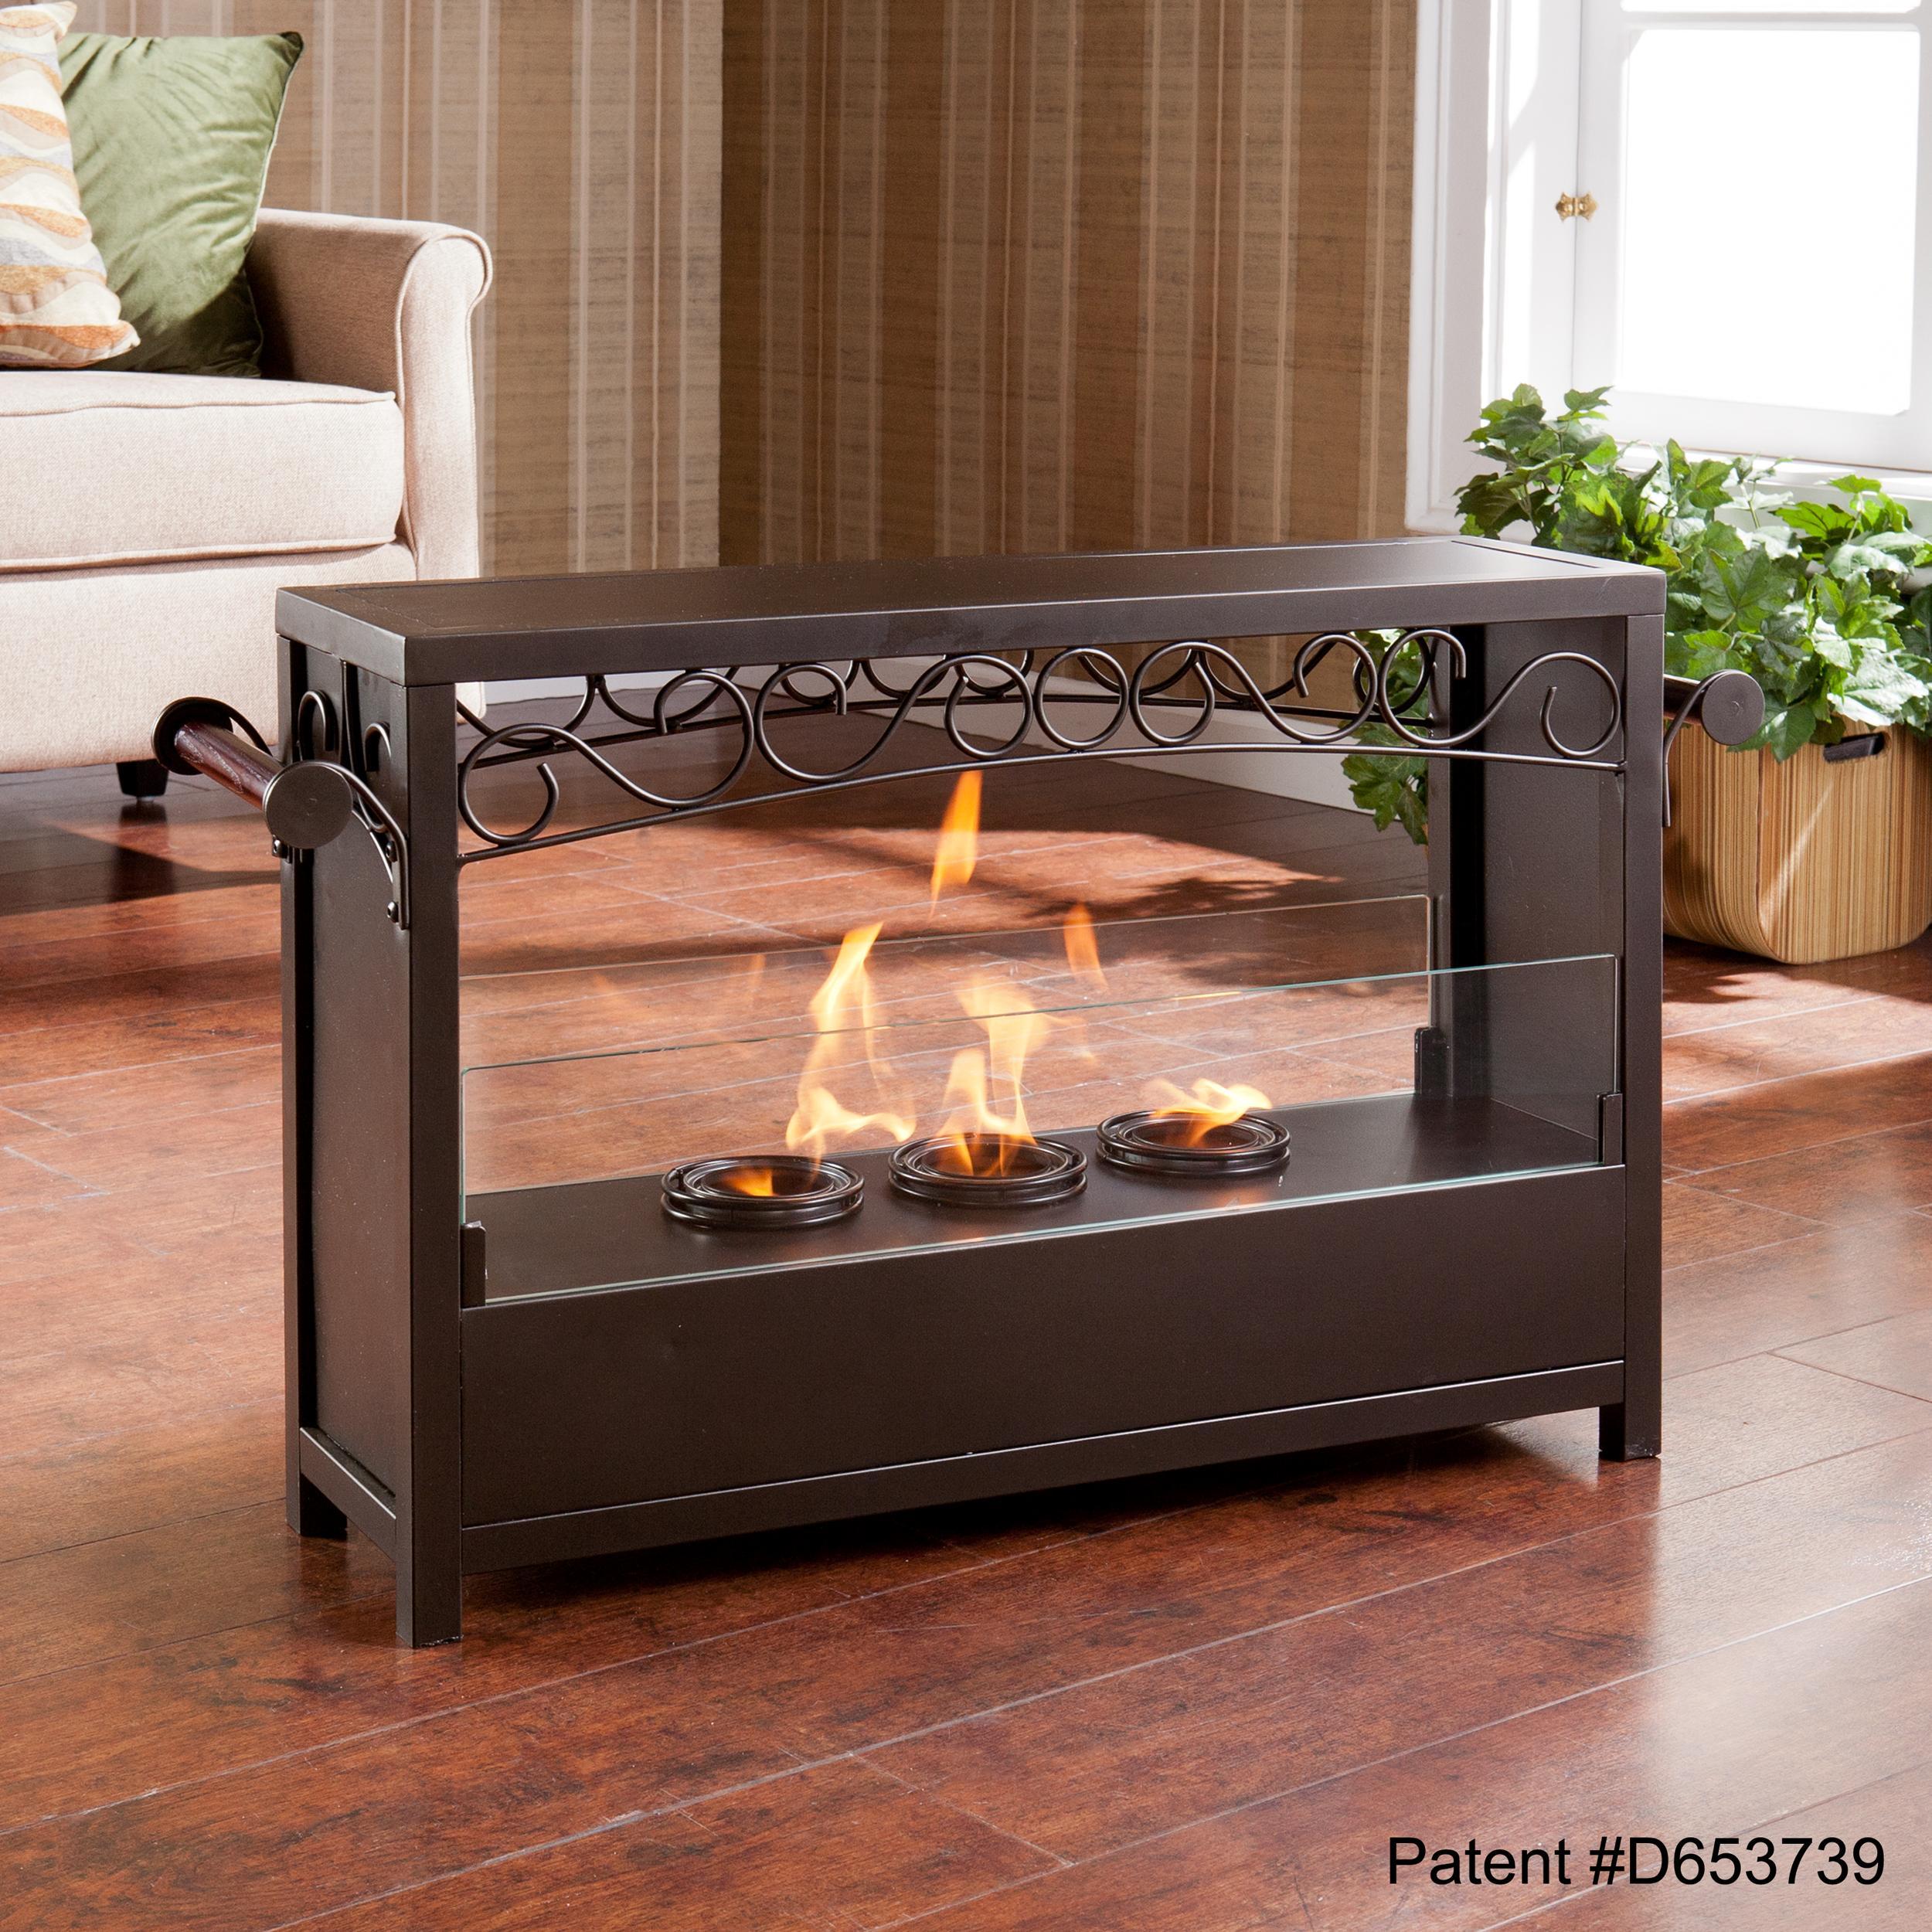 amazoncom sei amz acosta portable indooroutdoor fireplace  - view larger